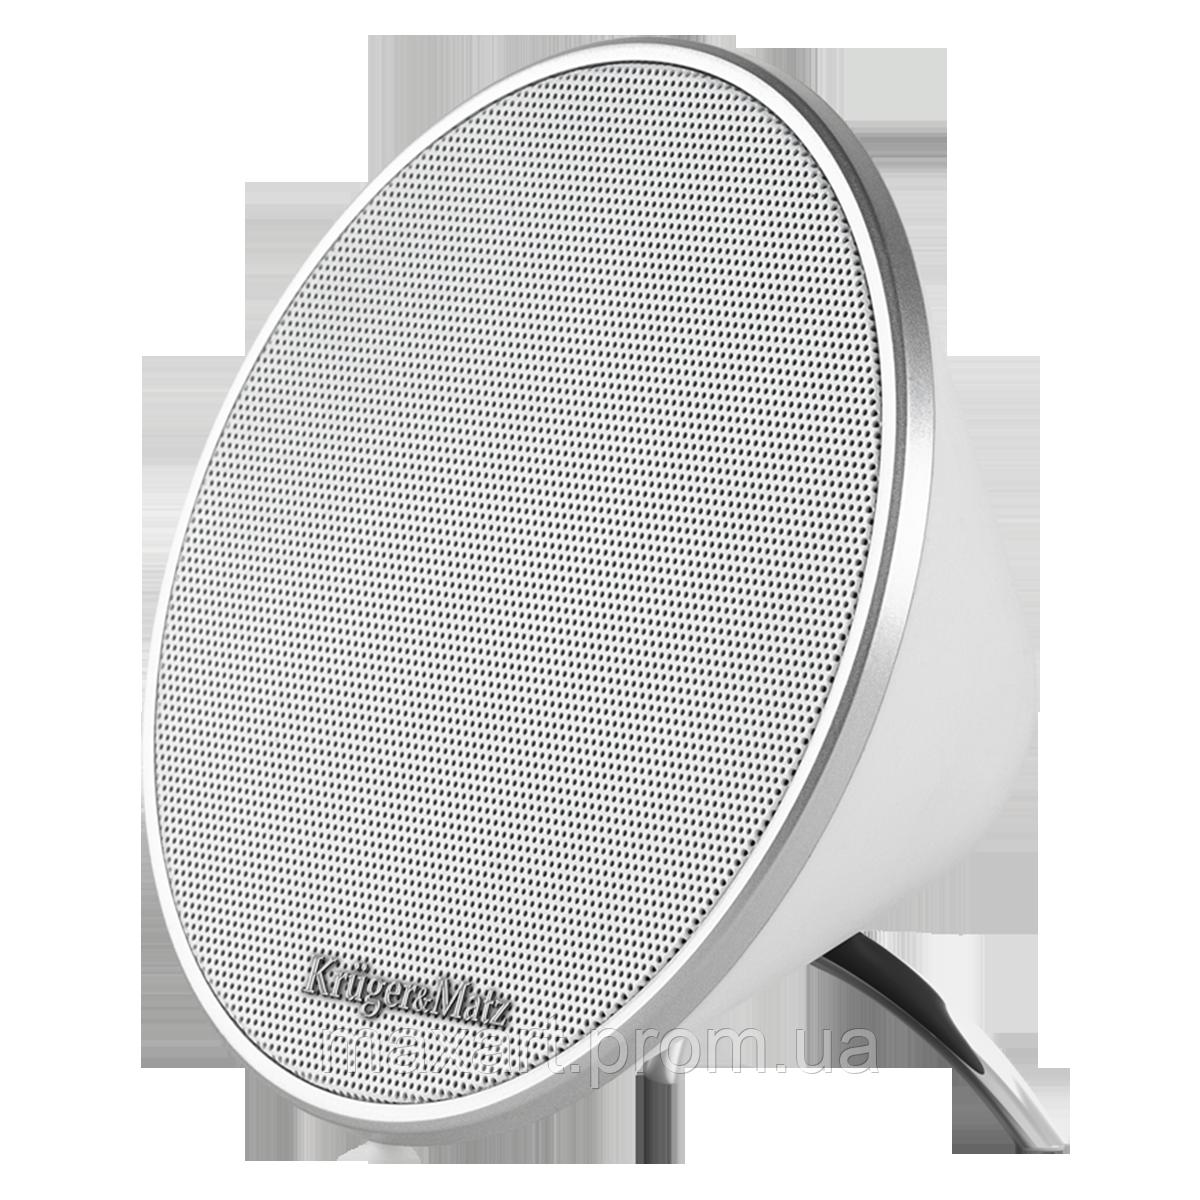 Колонка Kruger&Matz - SOUL (KM0519) White